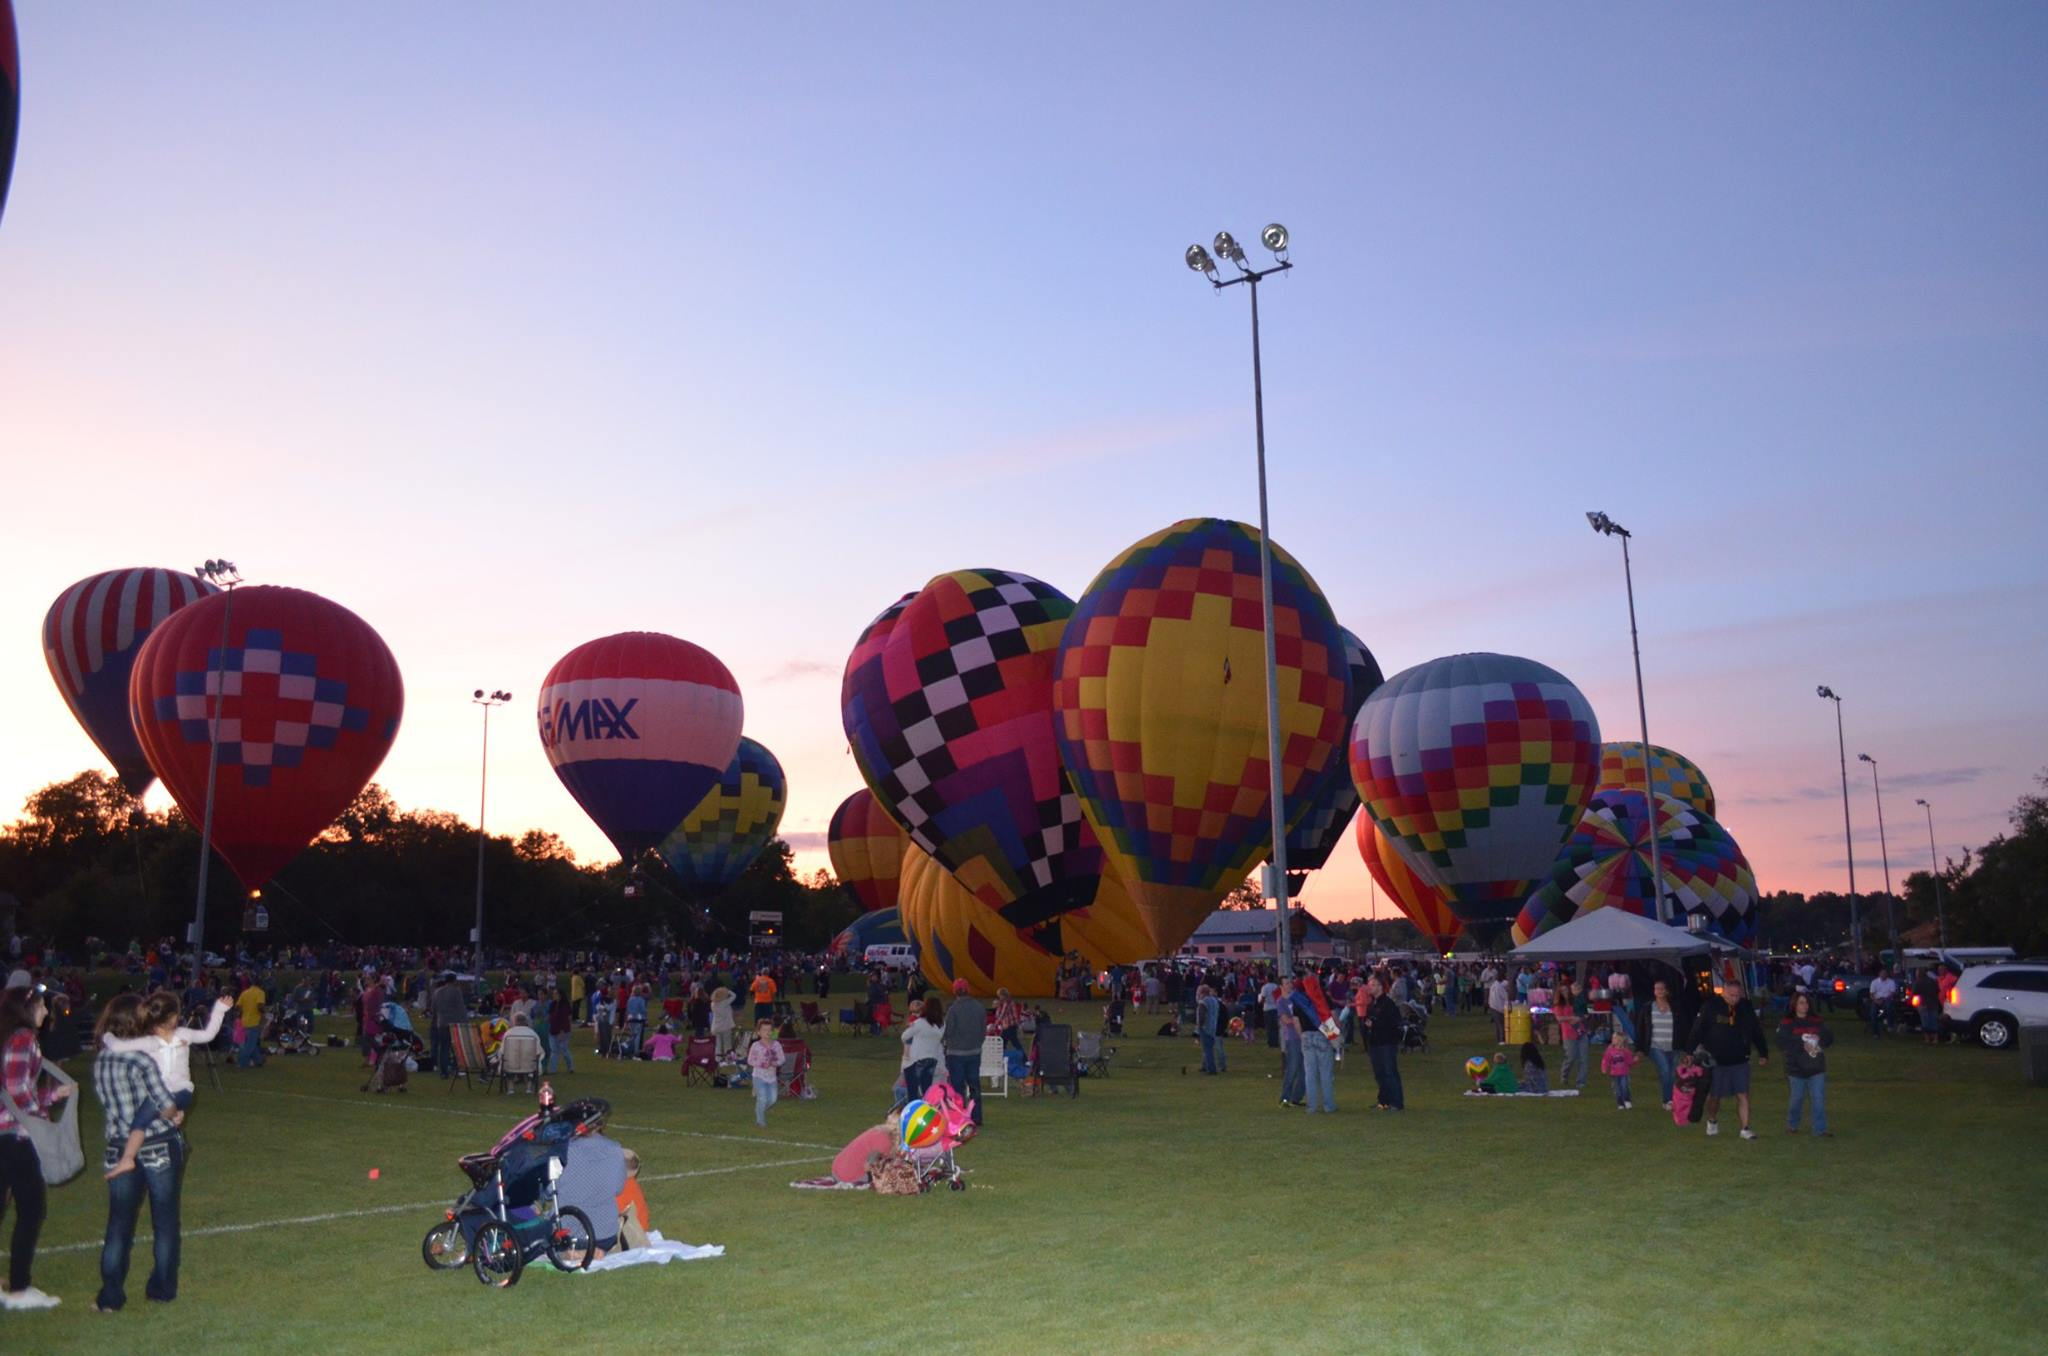 AR Hot Air Balloon Festival 2016